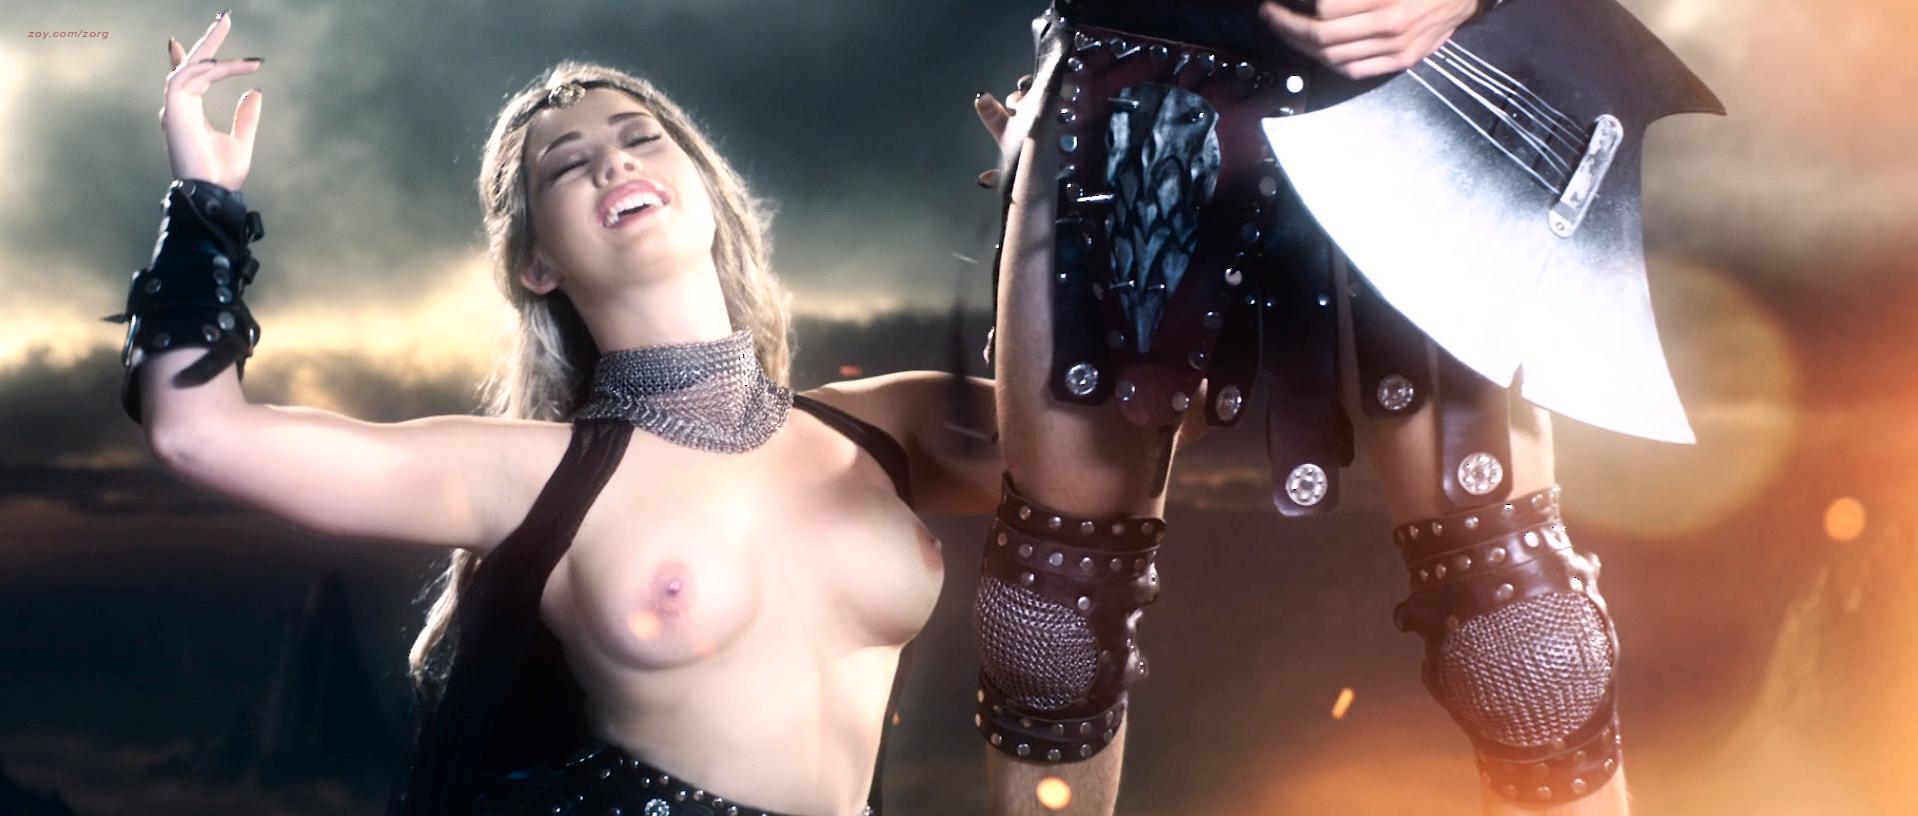 Nude Video Celebs Kimberley Crossman Nude Delaney Tabron Nude